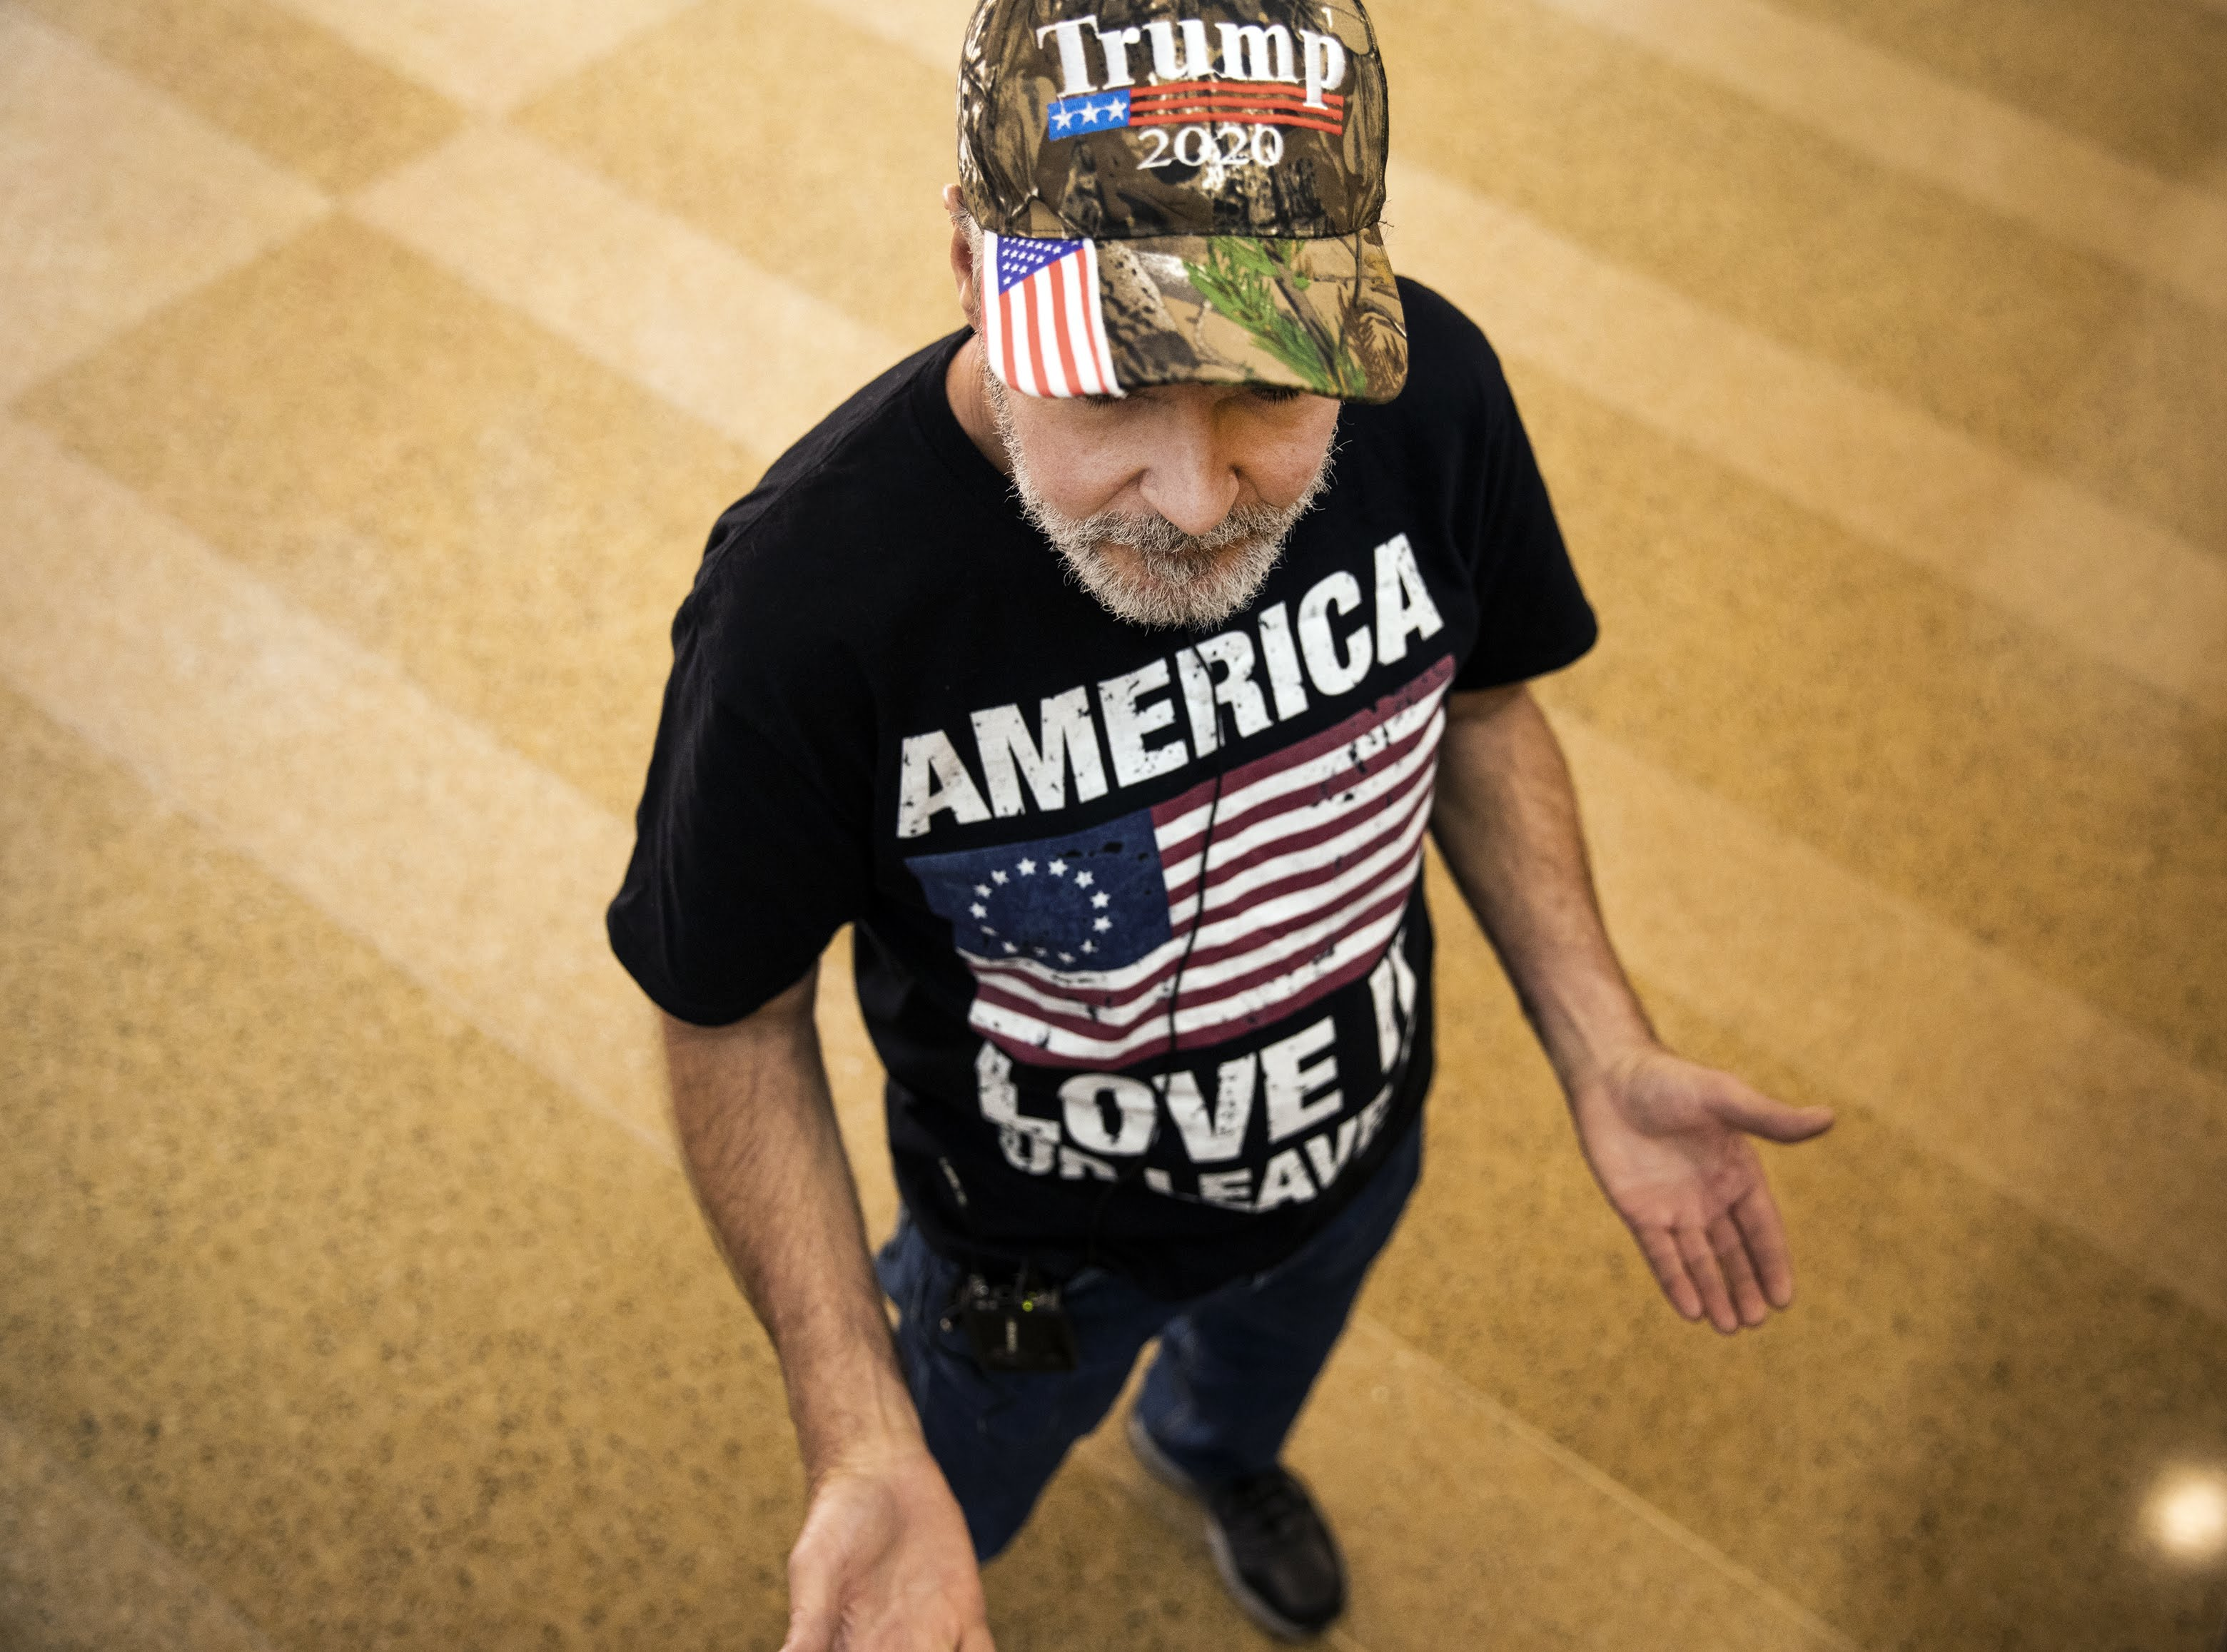 Trump volunteer talks to press